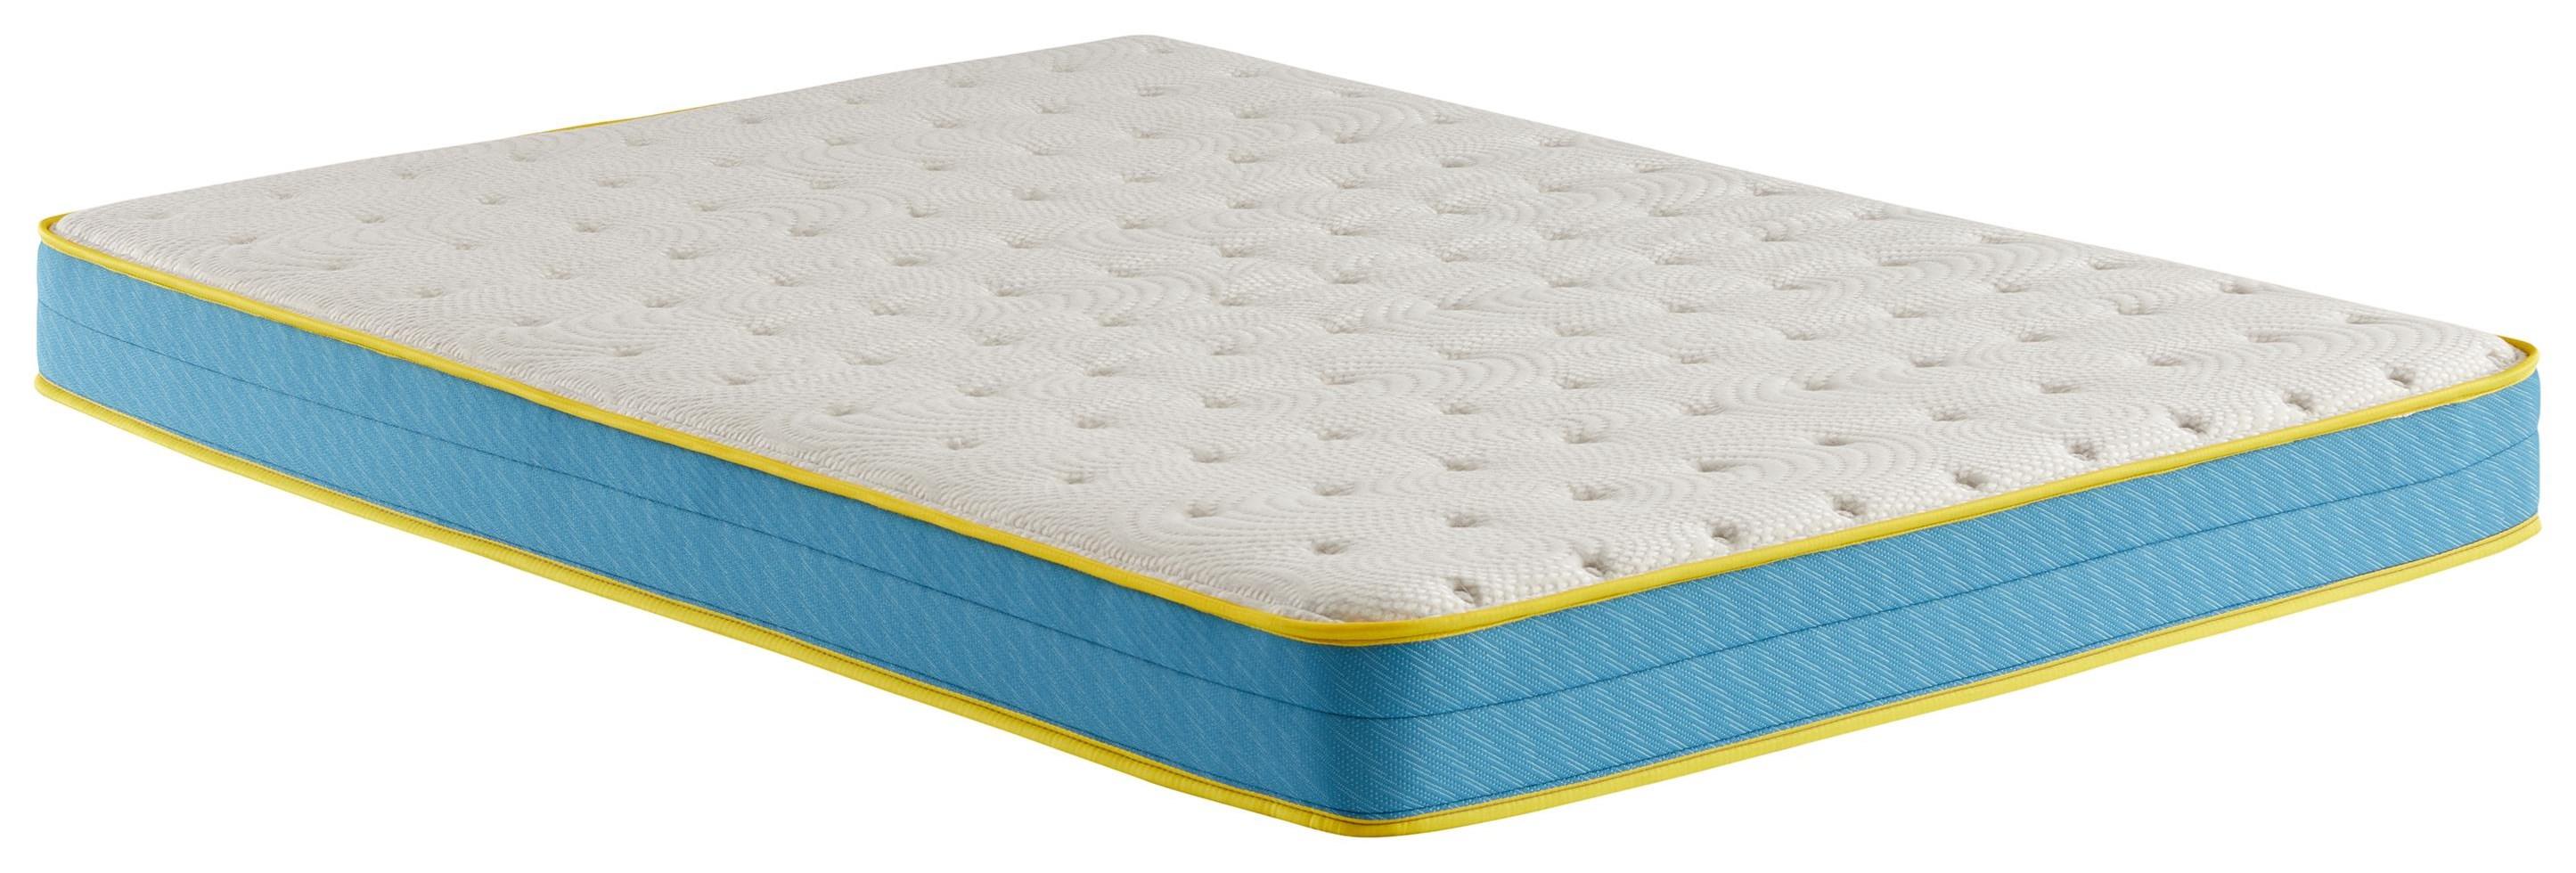 "Fairytale Town 6"" Twin Comfort Foam Mattress by Corsicana at Beck's Furniture"